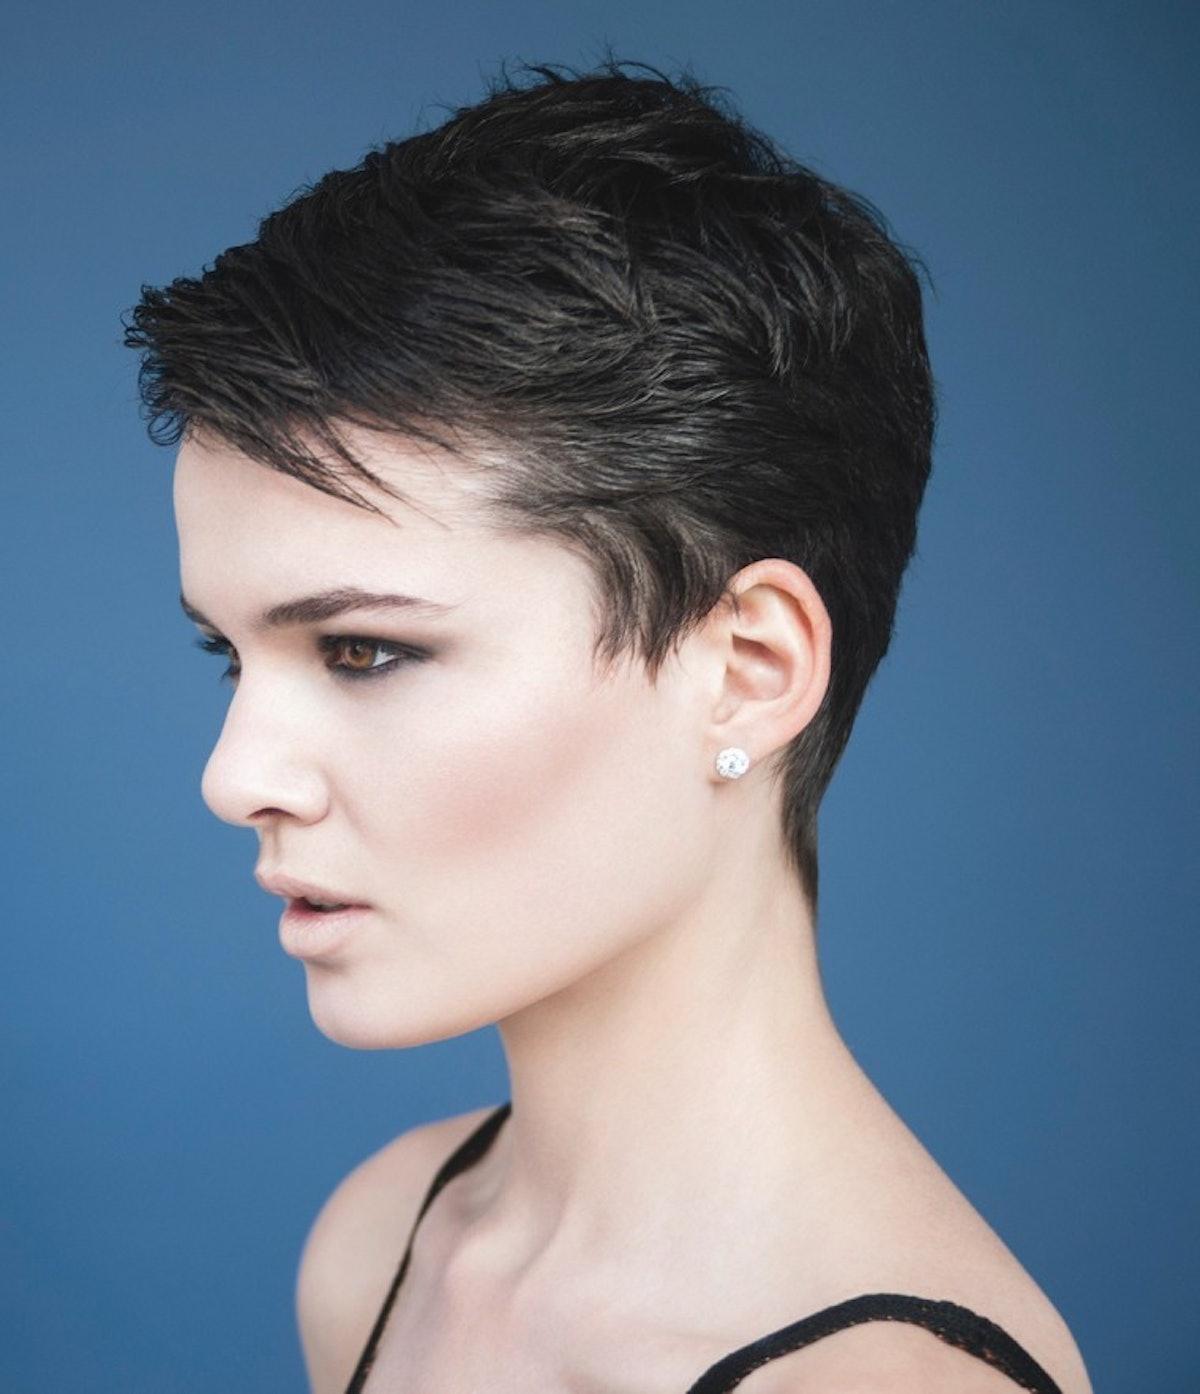 Short Hair Inspiration